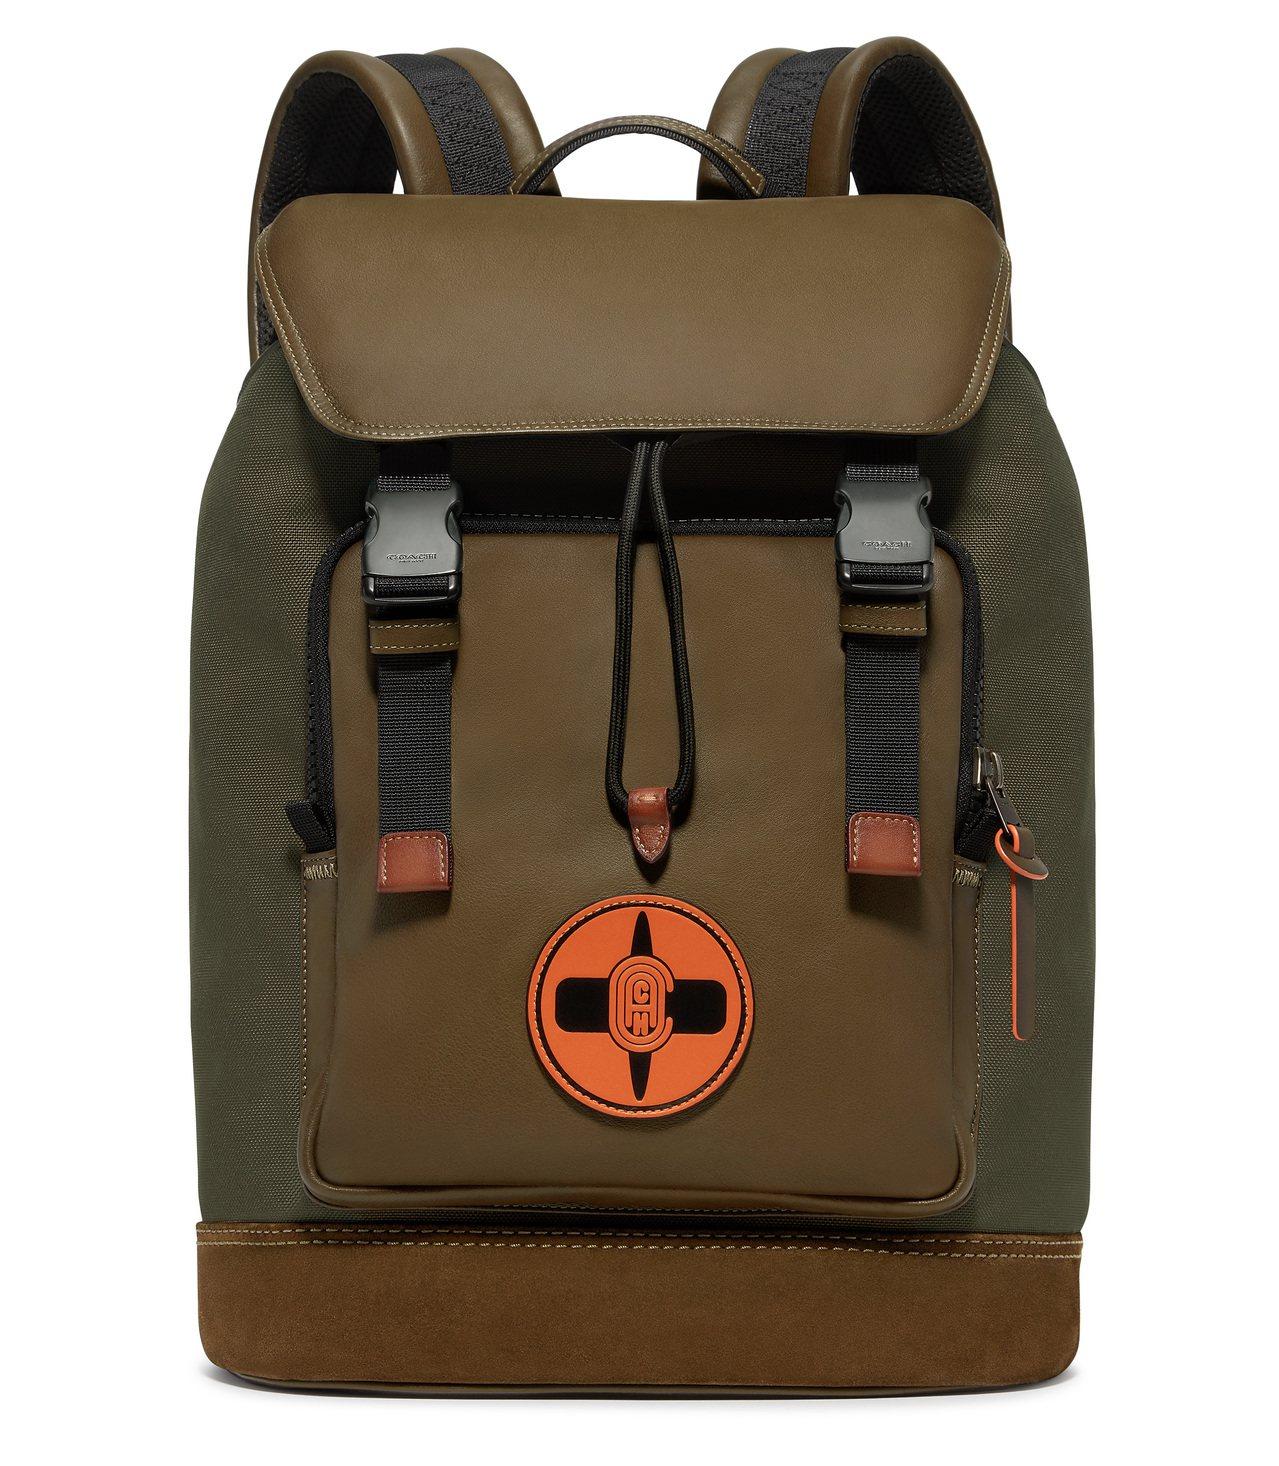 COACH X MBJ後背包,售價27,800元。圖/COACH提供